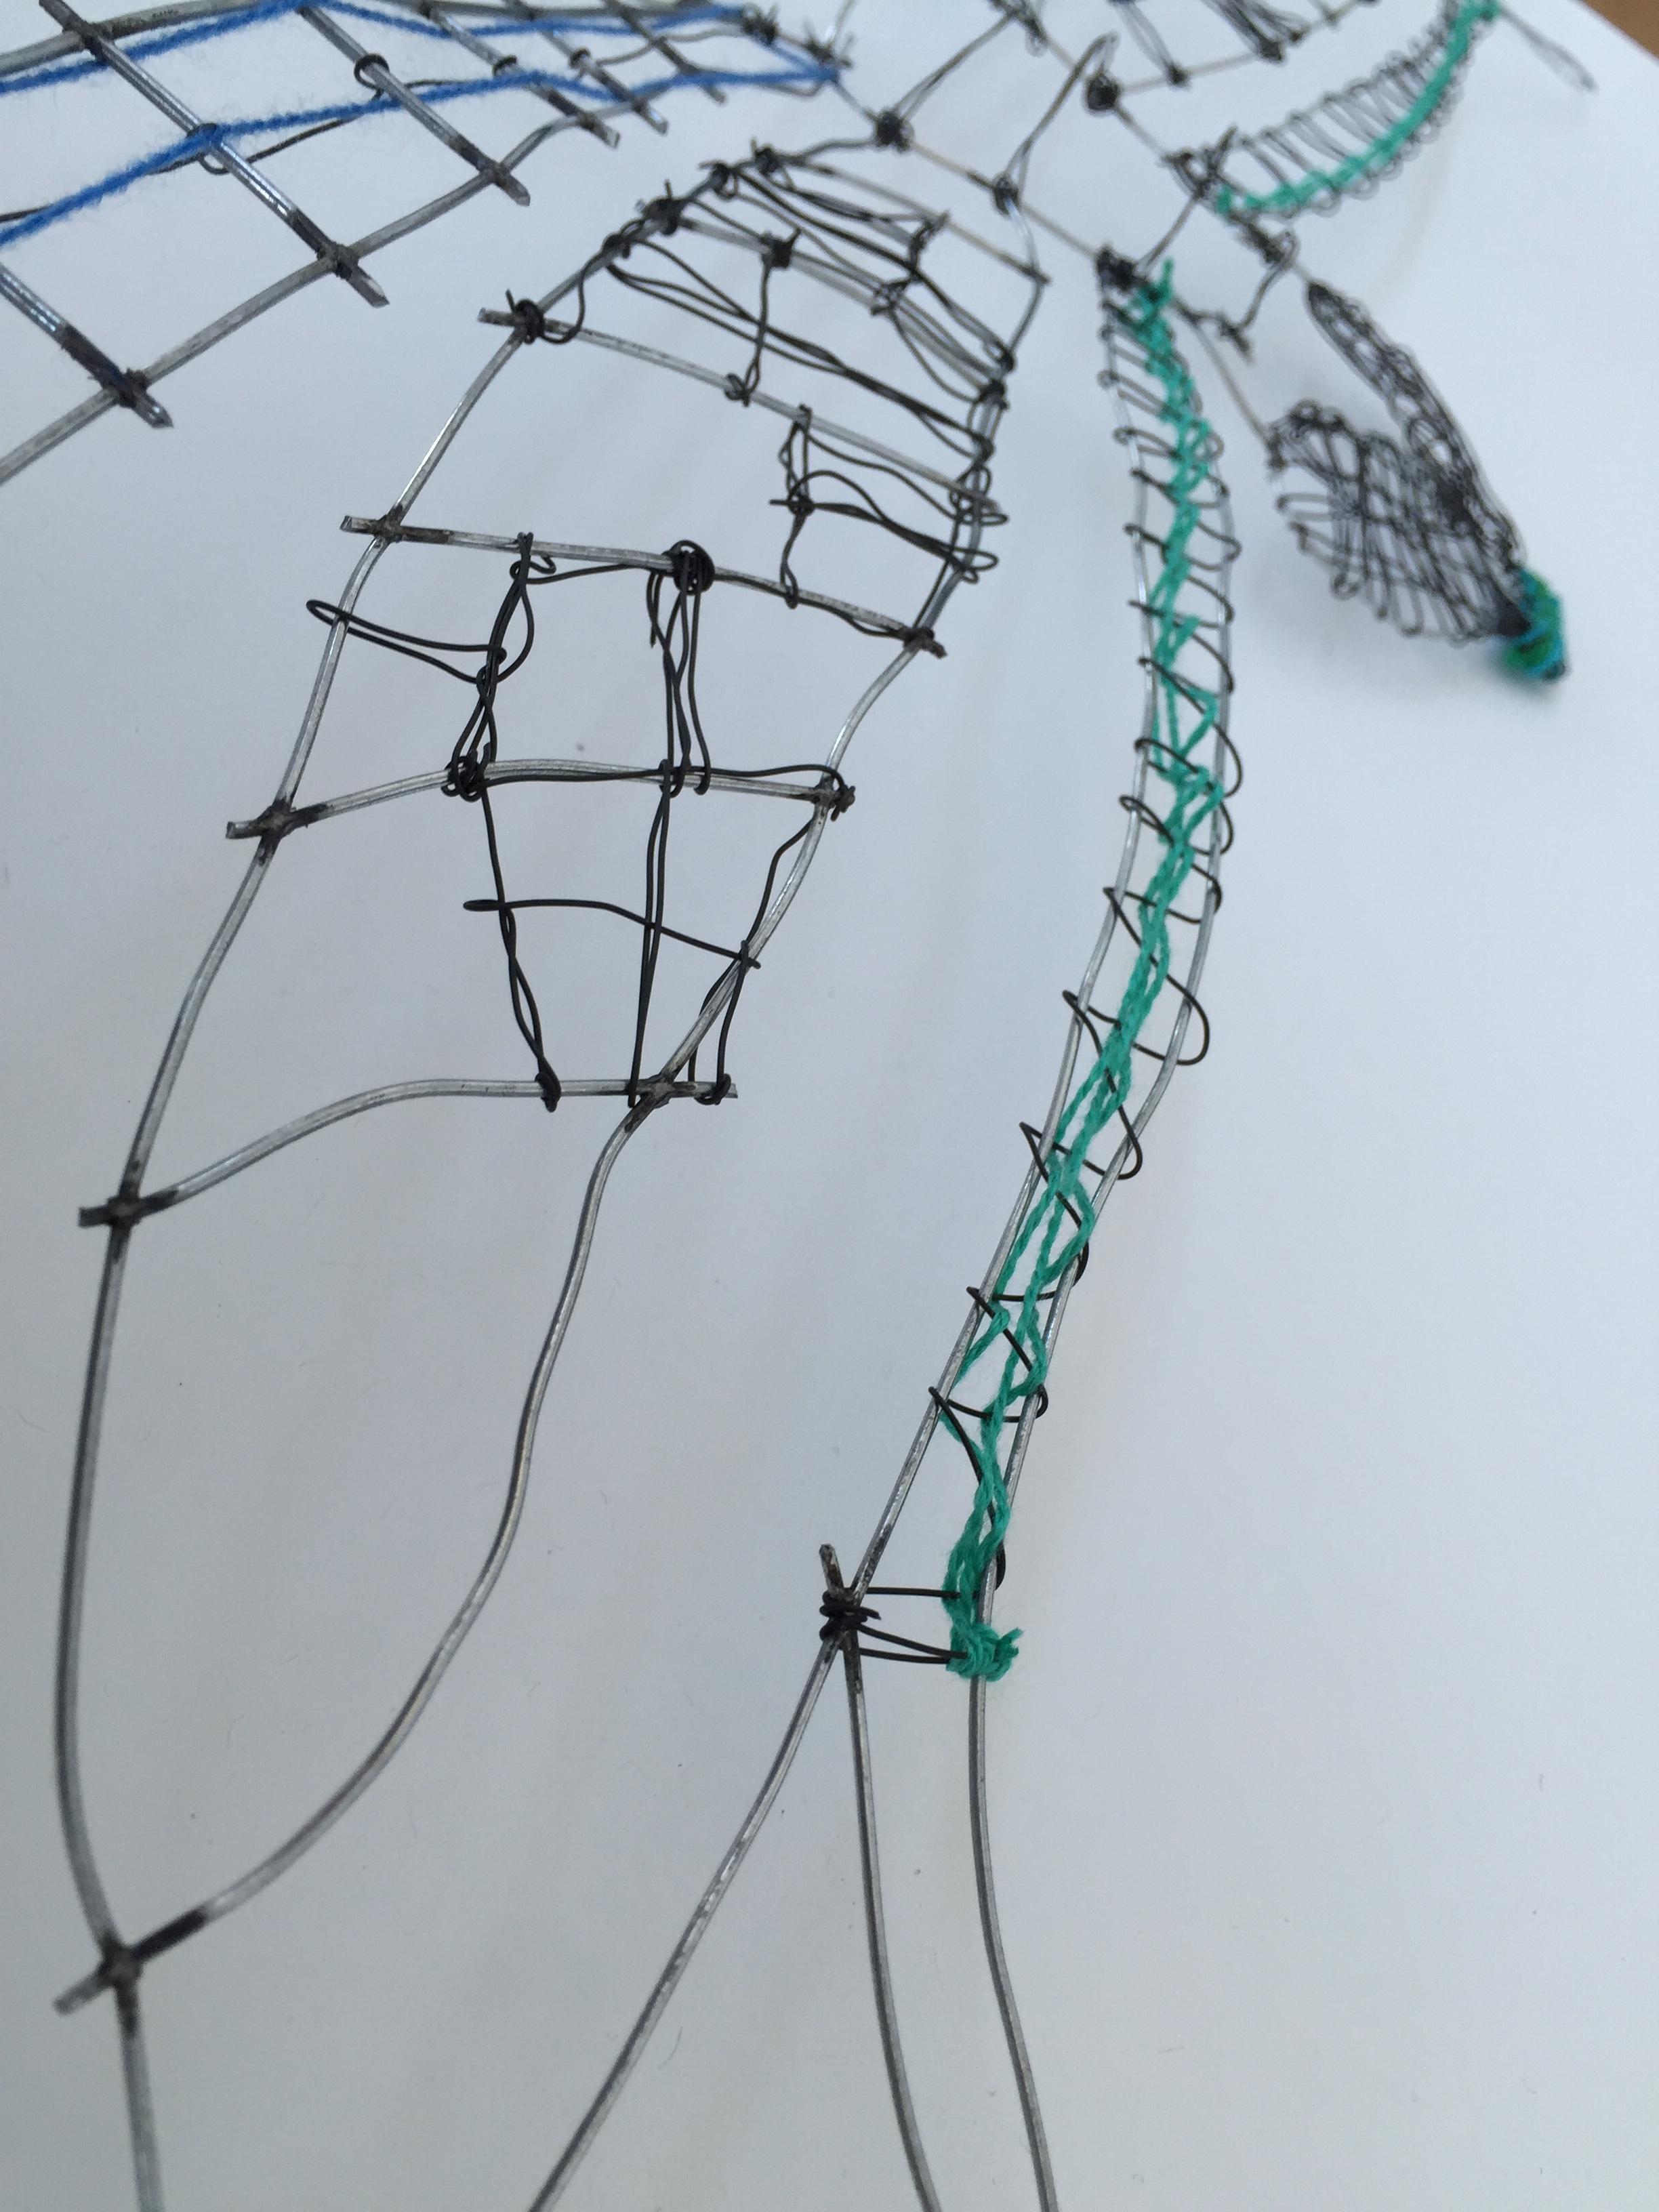 Wire – lucyhulmeualfadblackburn